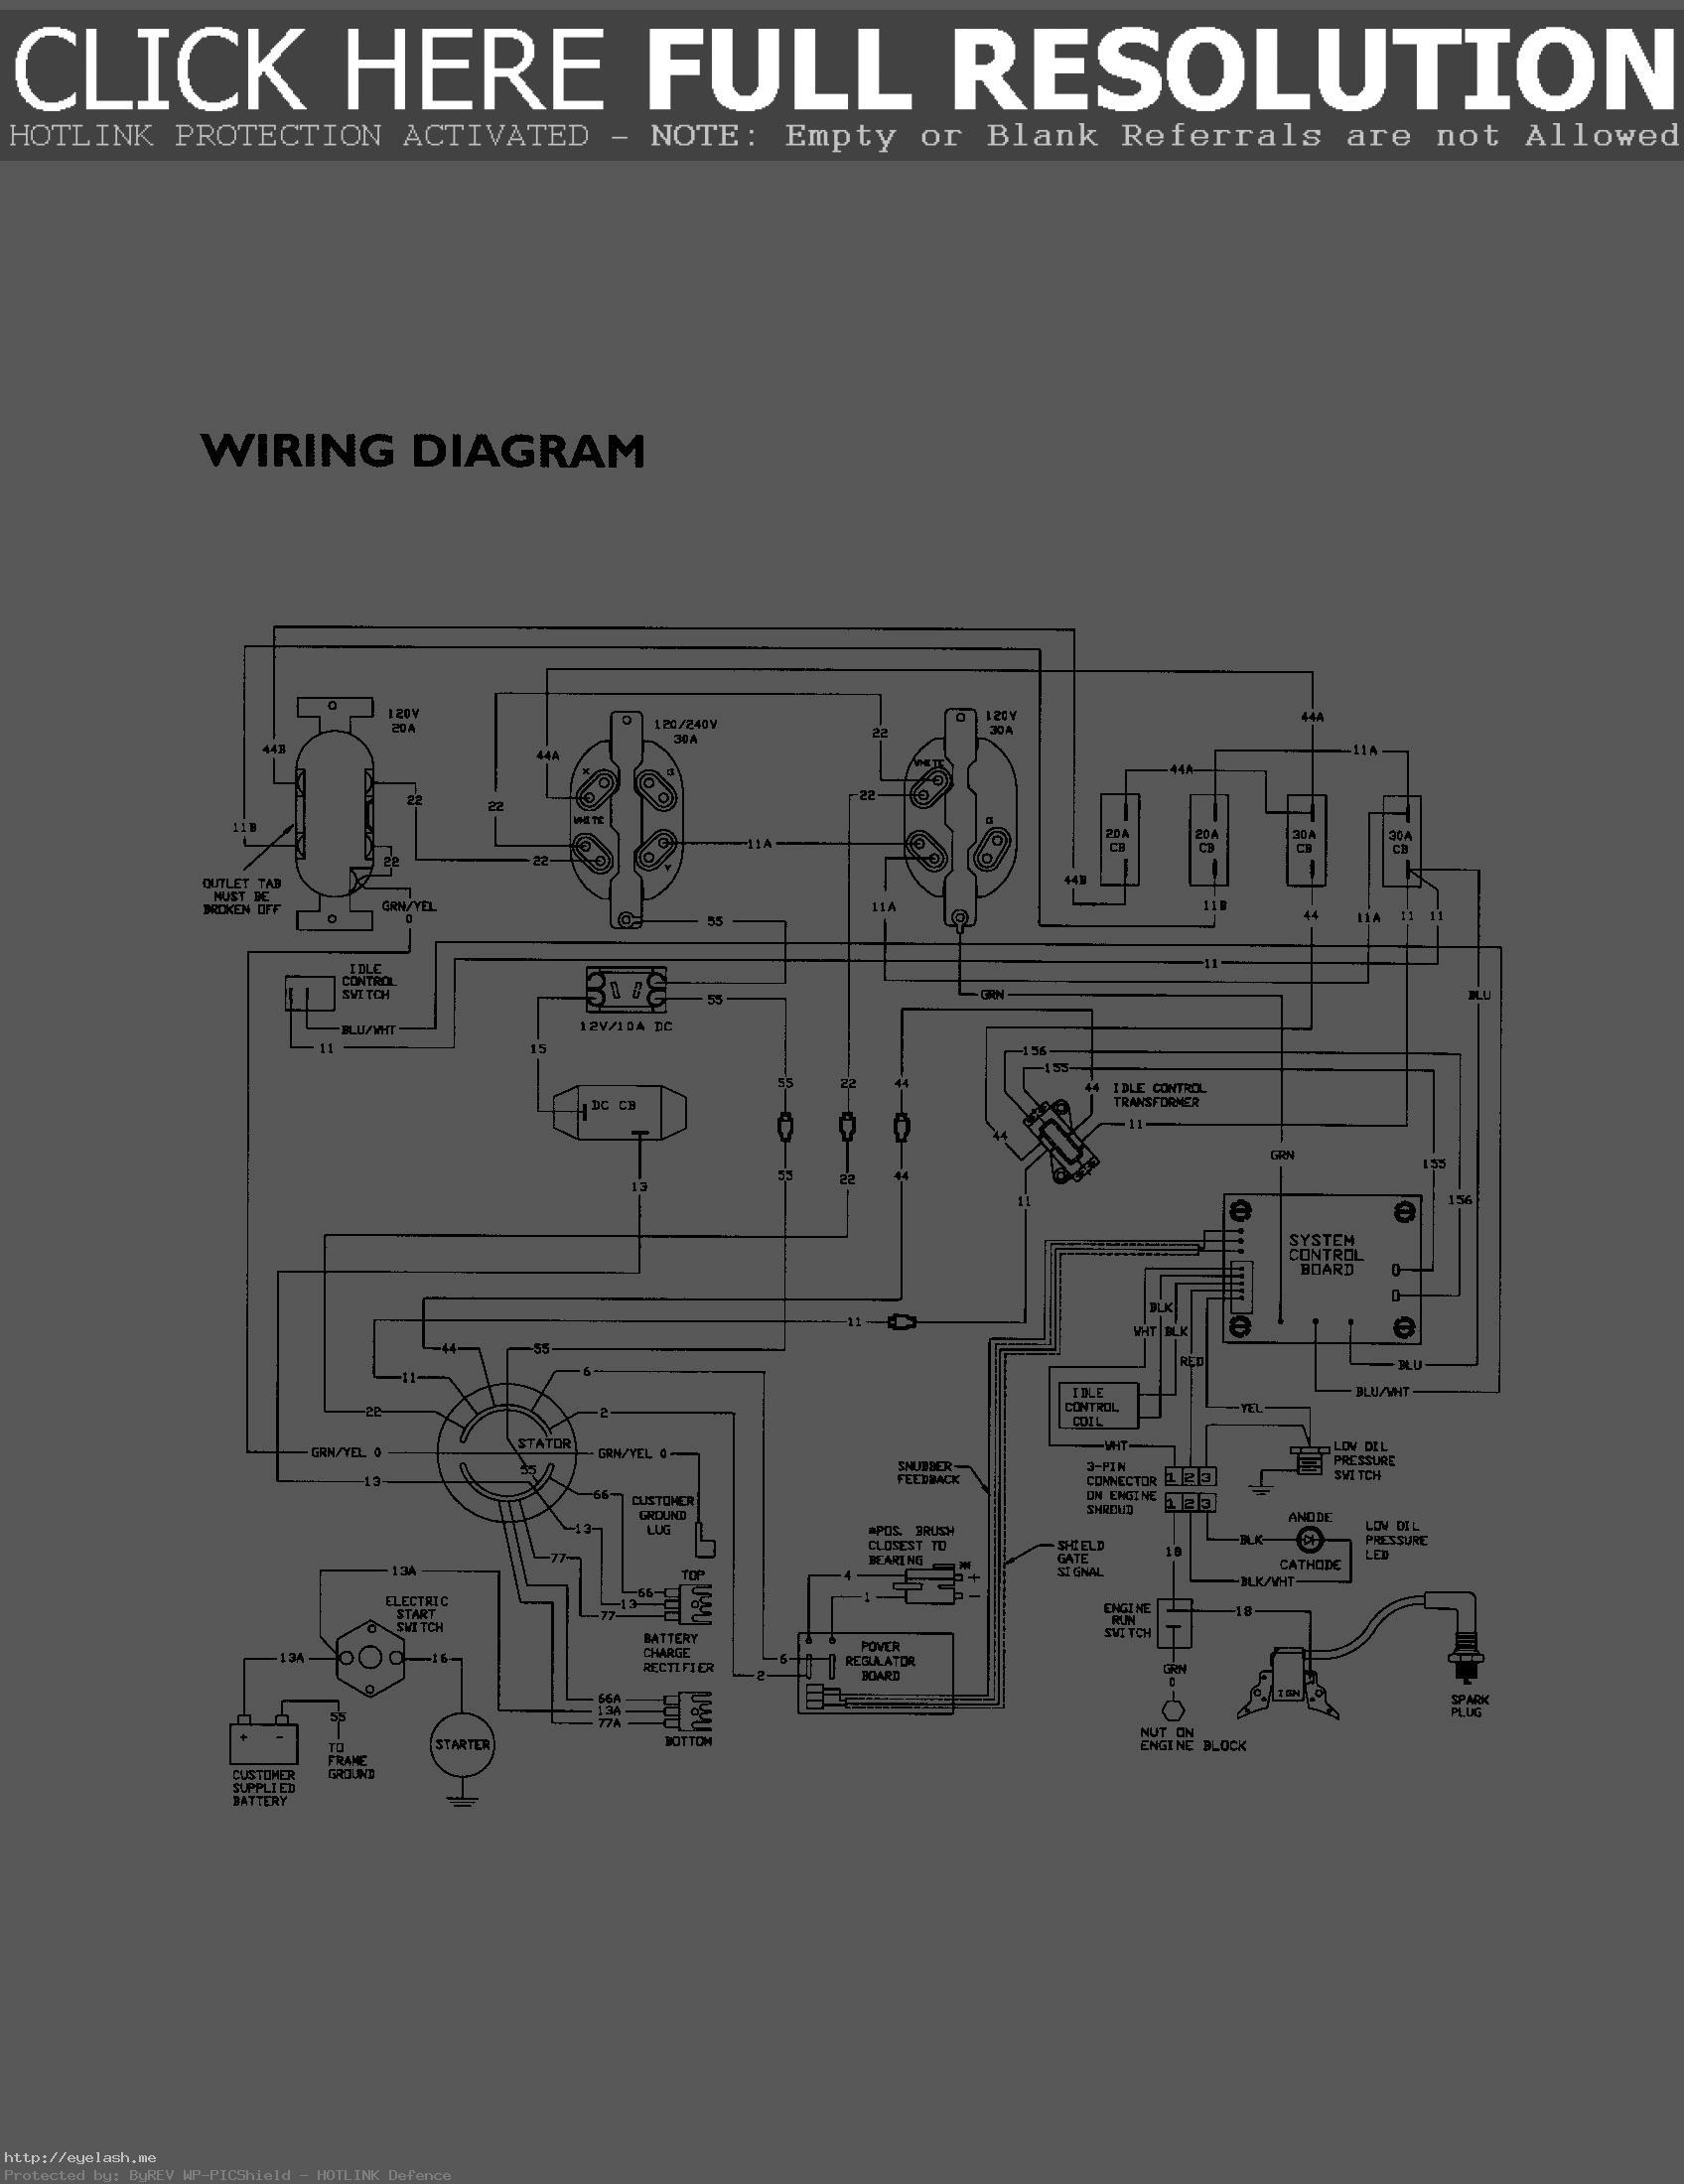 generac engine wiring diagram gh 6885  generator wiring diagram on generac rv generator wiring  generator wiring diagram on generac rv